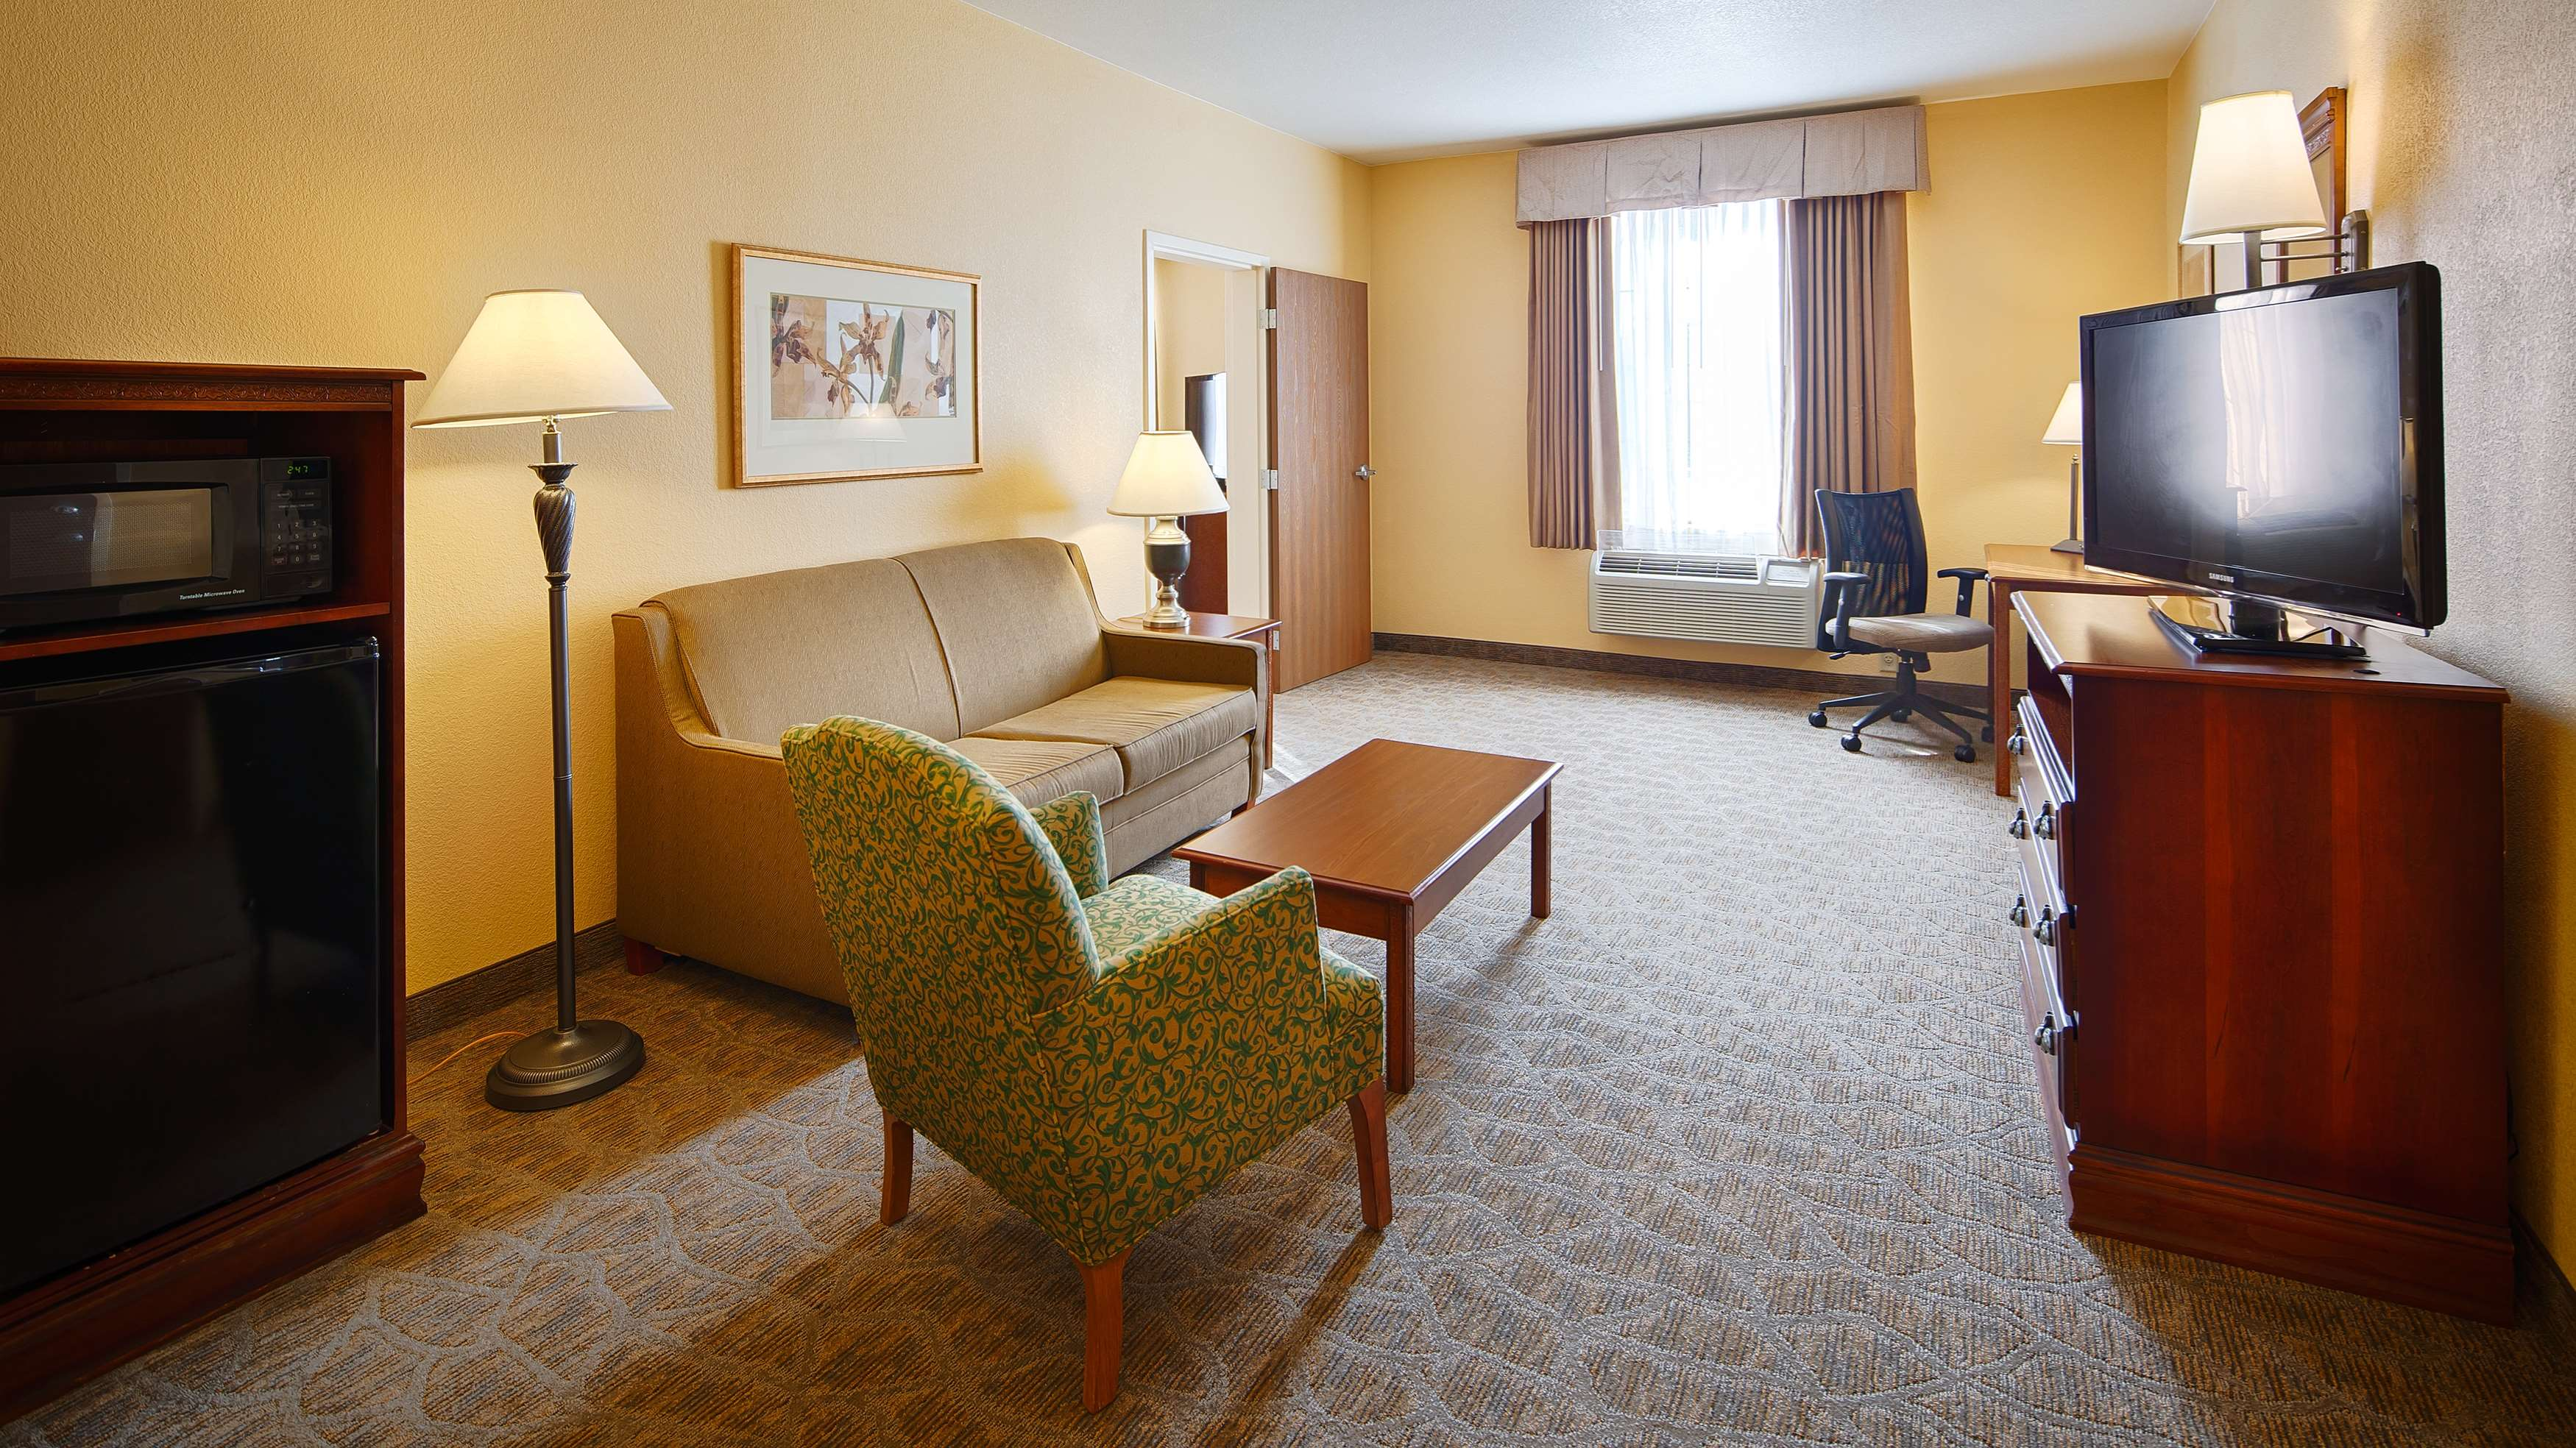 Best Western Plus Executive Hotel & Suites image 26